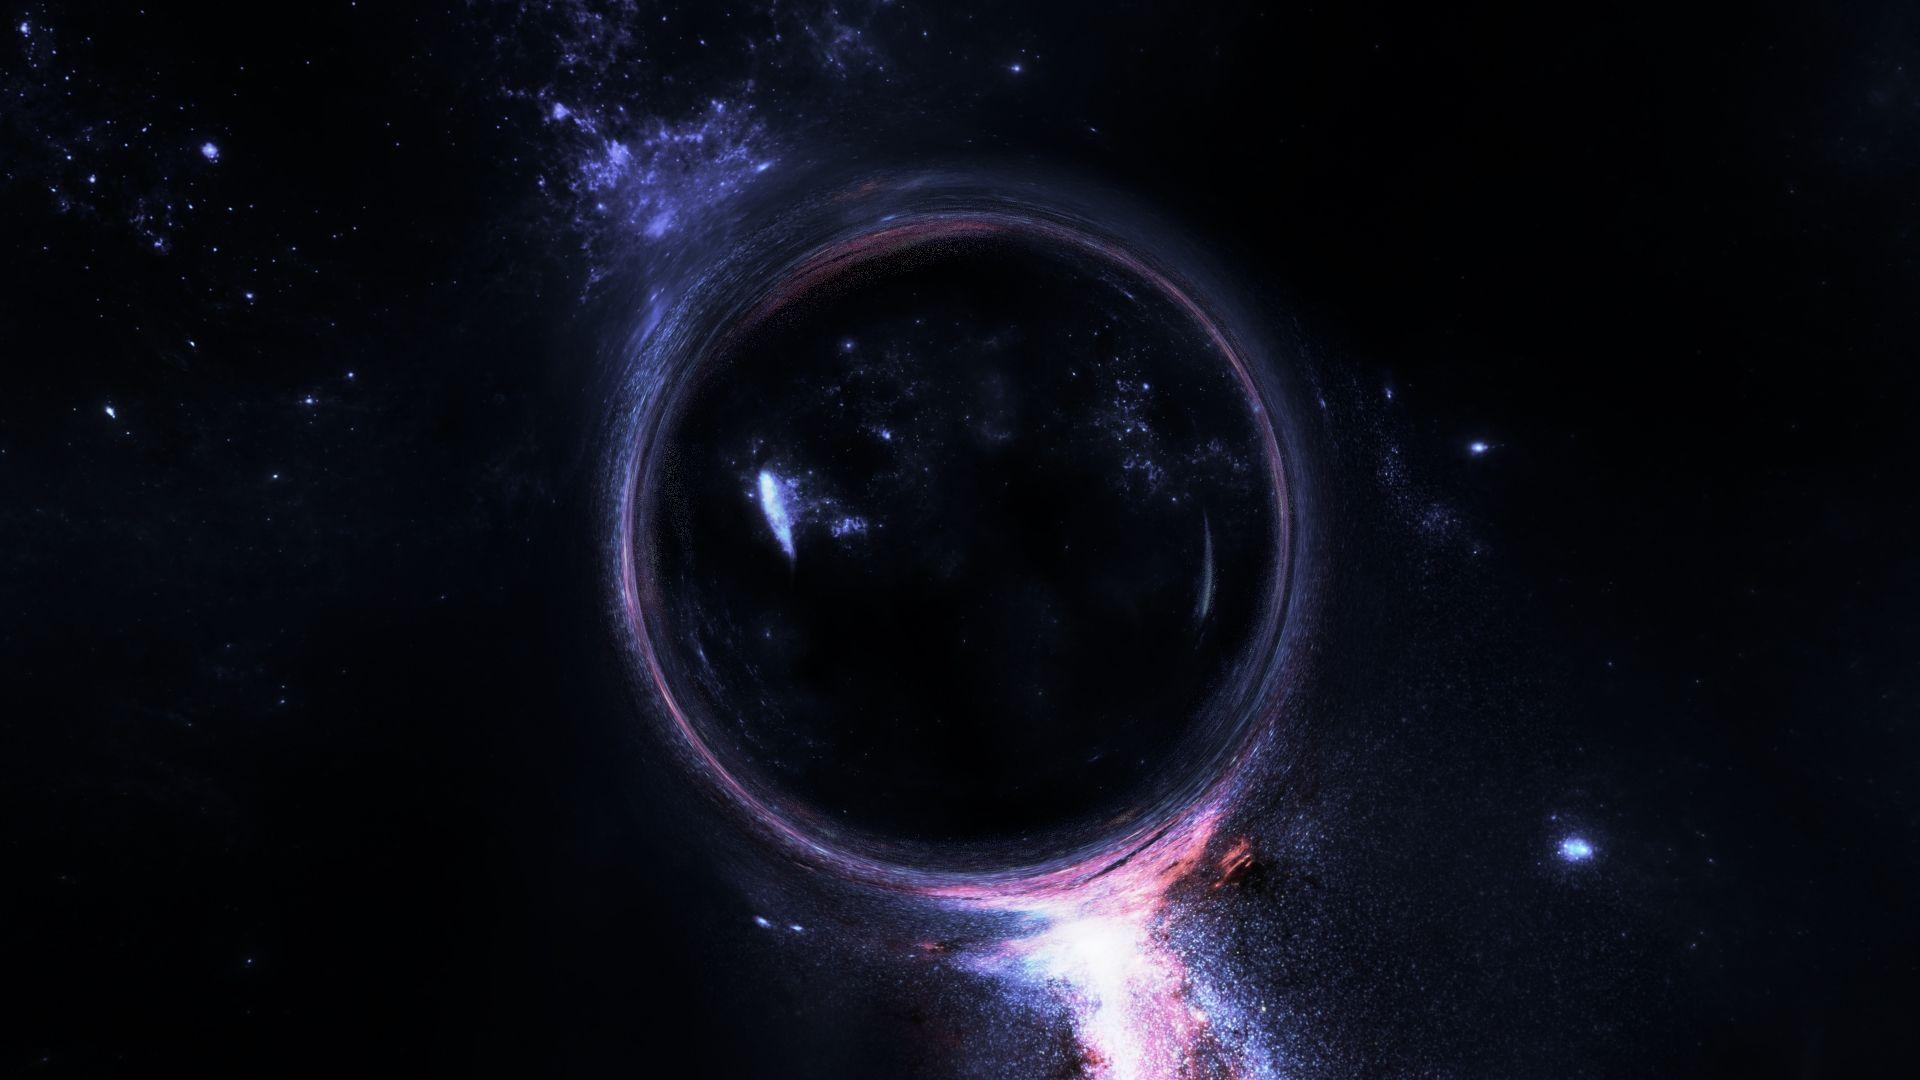 Black Hole, Nice Wallpaper